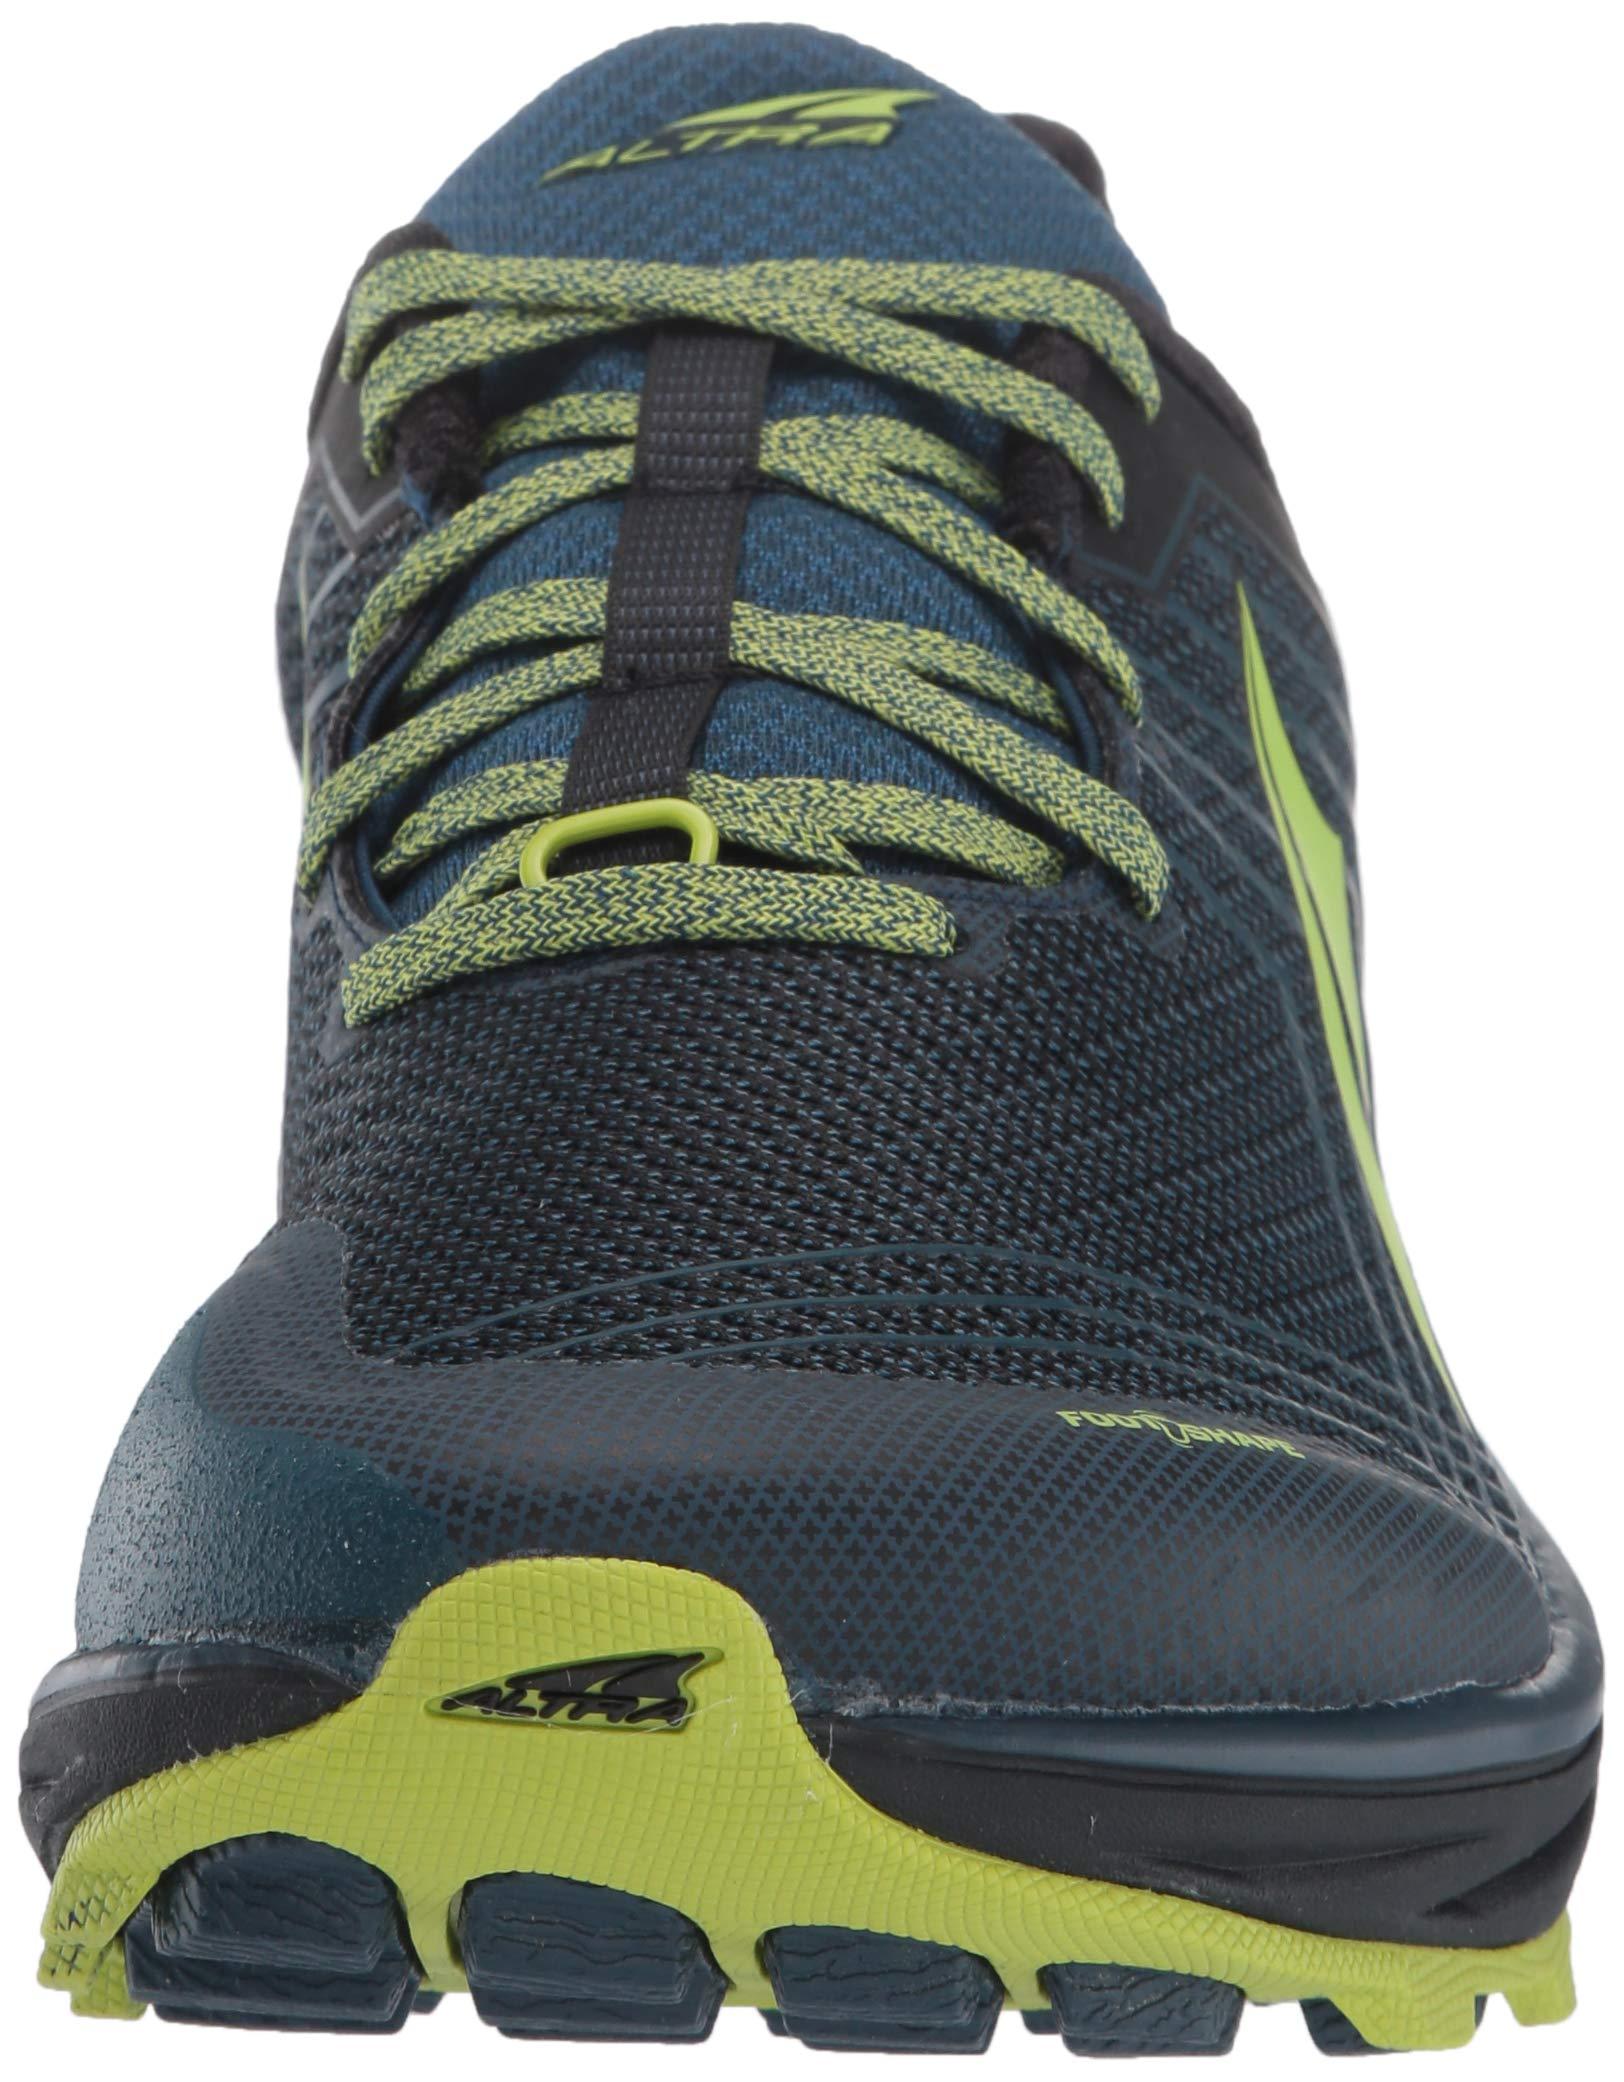 Altra Footwear Men's TIMP 1.5 Blue/Lime 7 D US by Altra (Image #4)